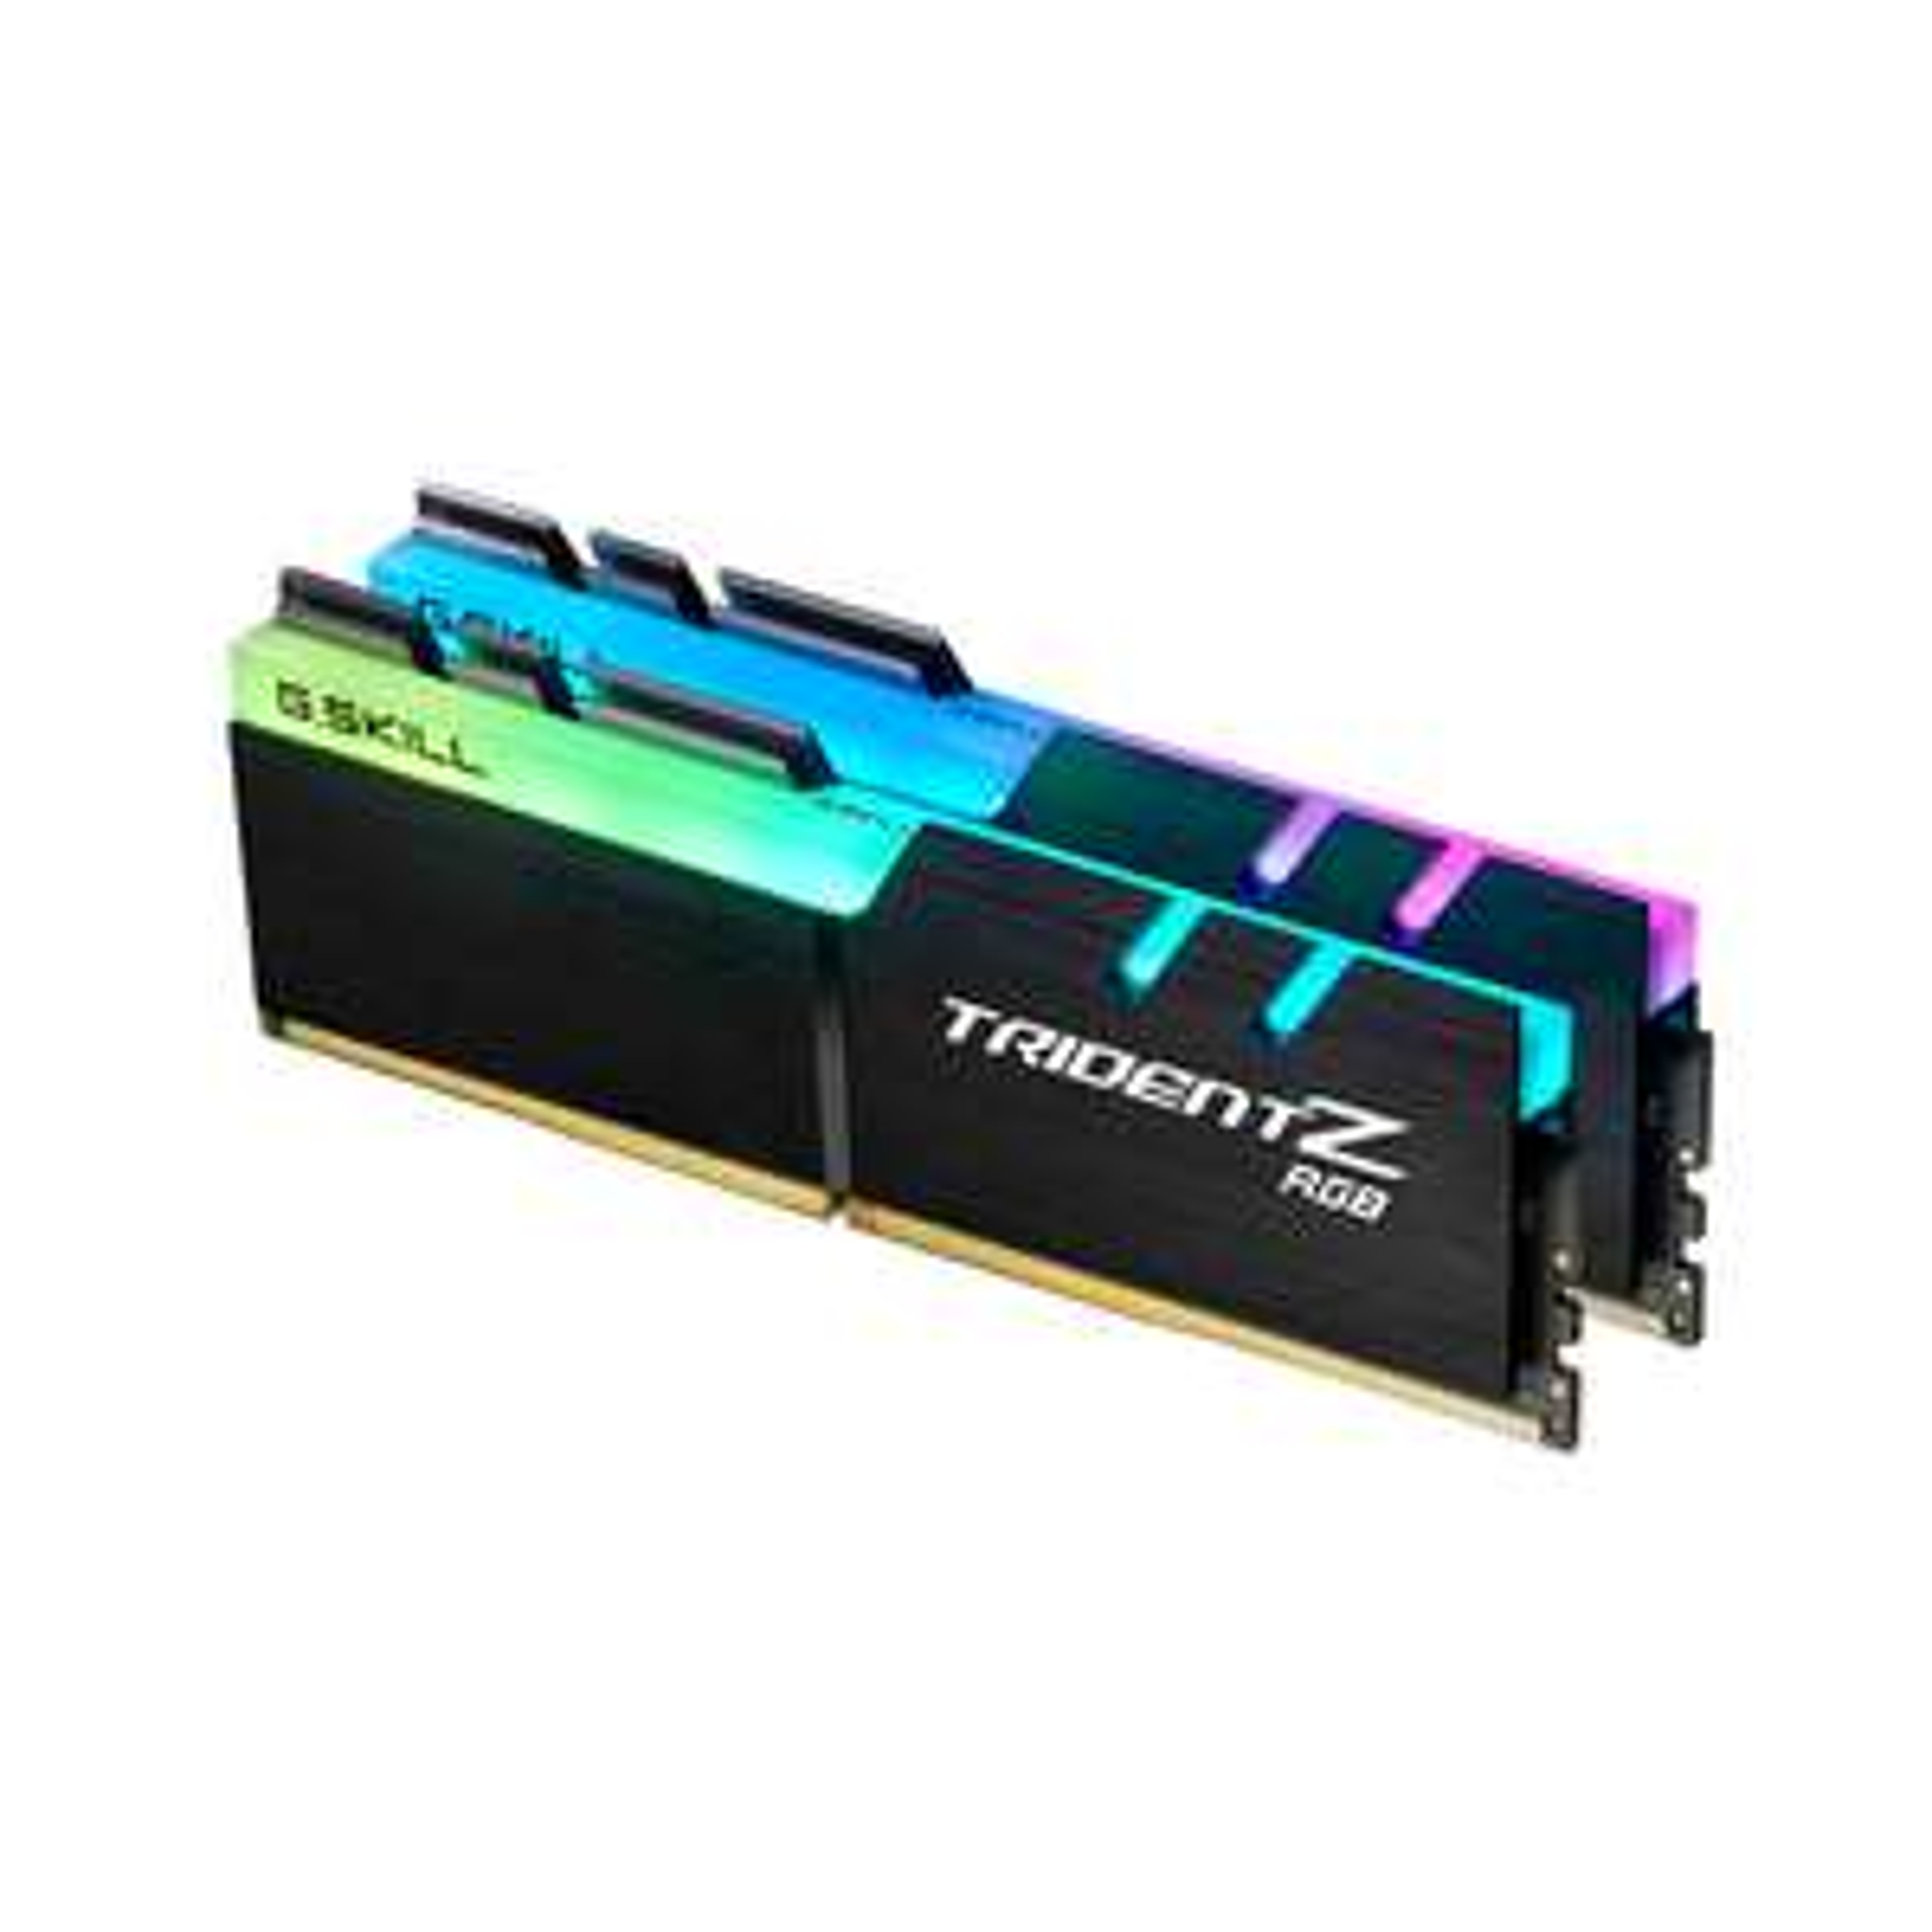 G.Skill Trident Z RGB DIMM Kit 32GB, DDR4-3600, CL16-16-16-36 (F4-3600C16D-32GTZR)